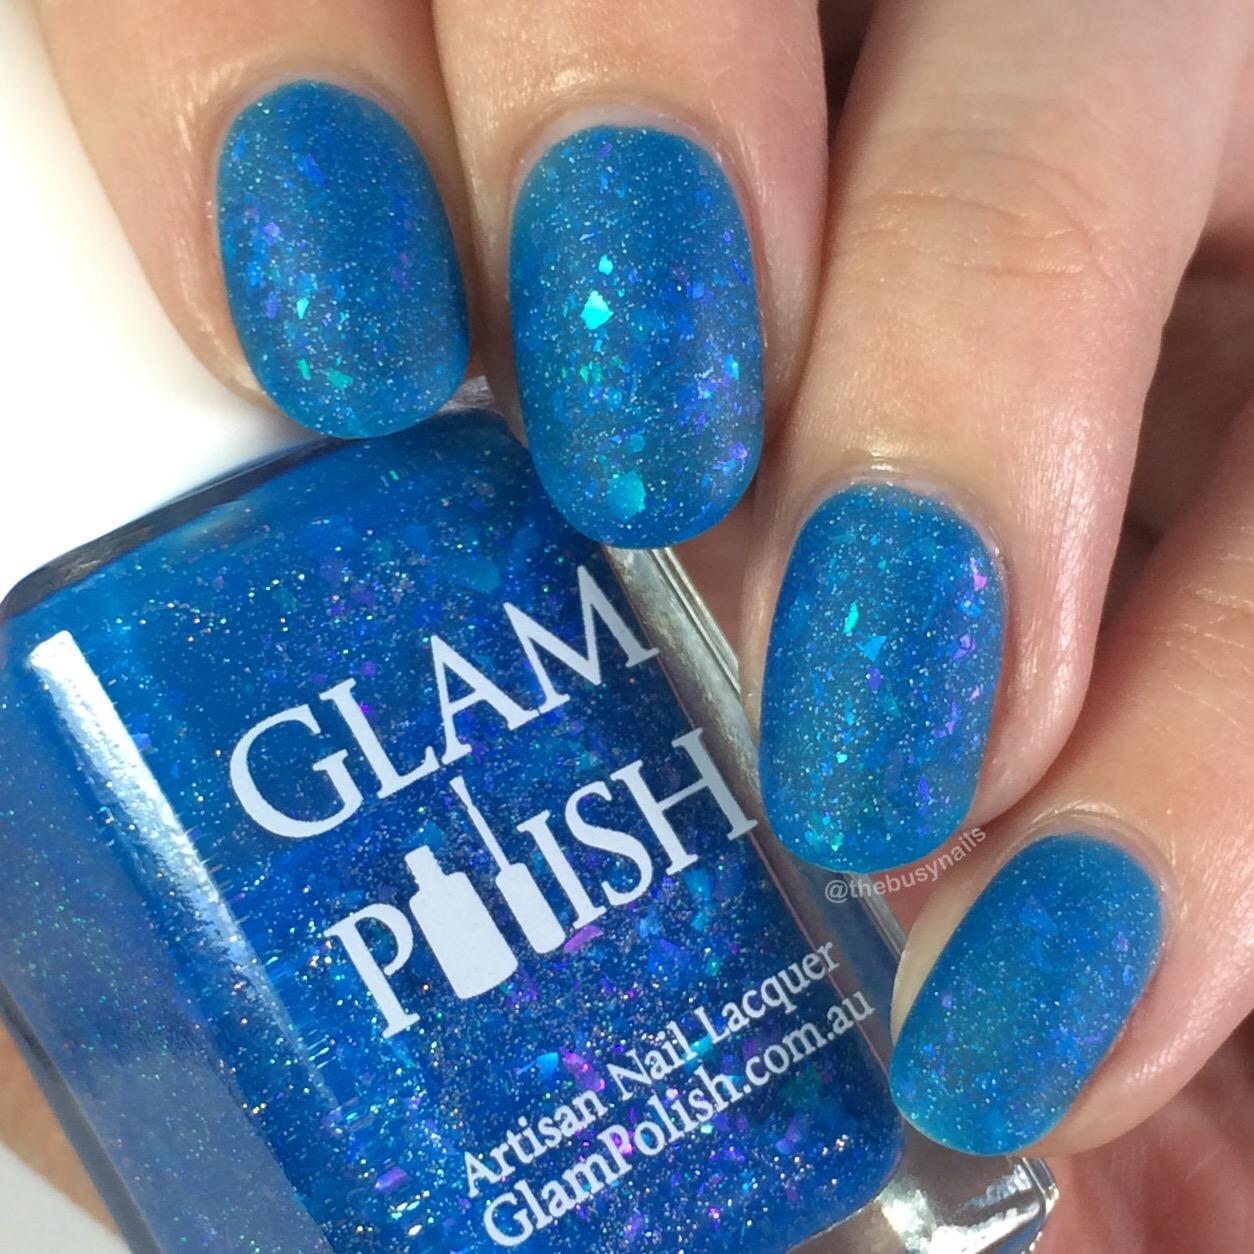 glam-polish-life-bubbles2.jpg